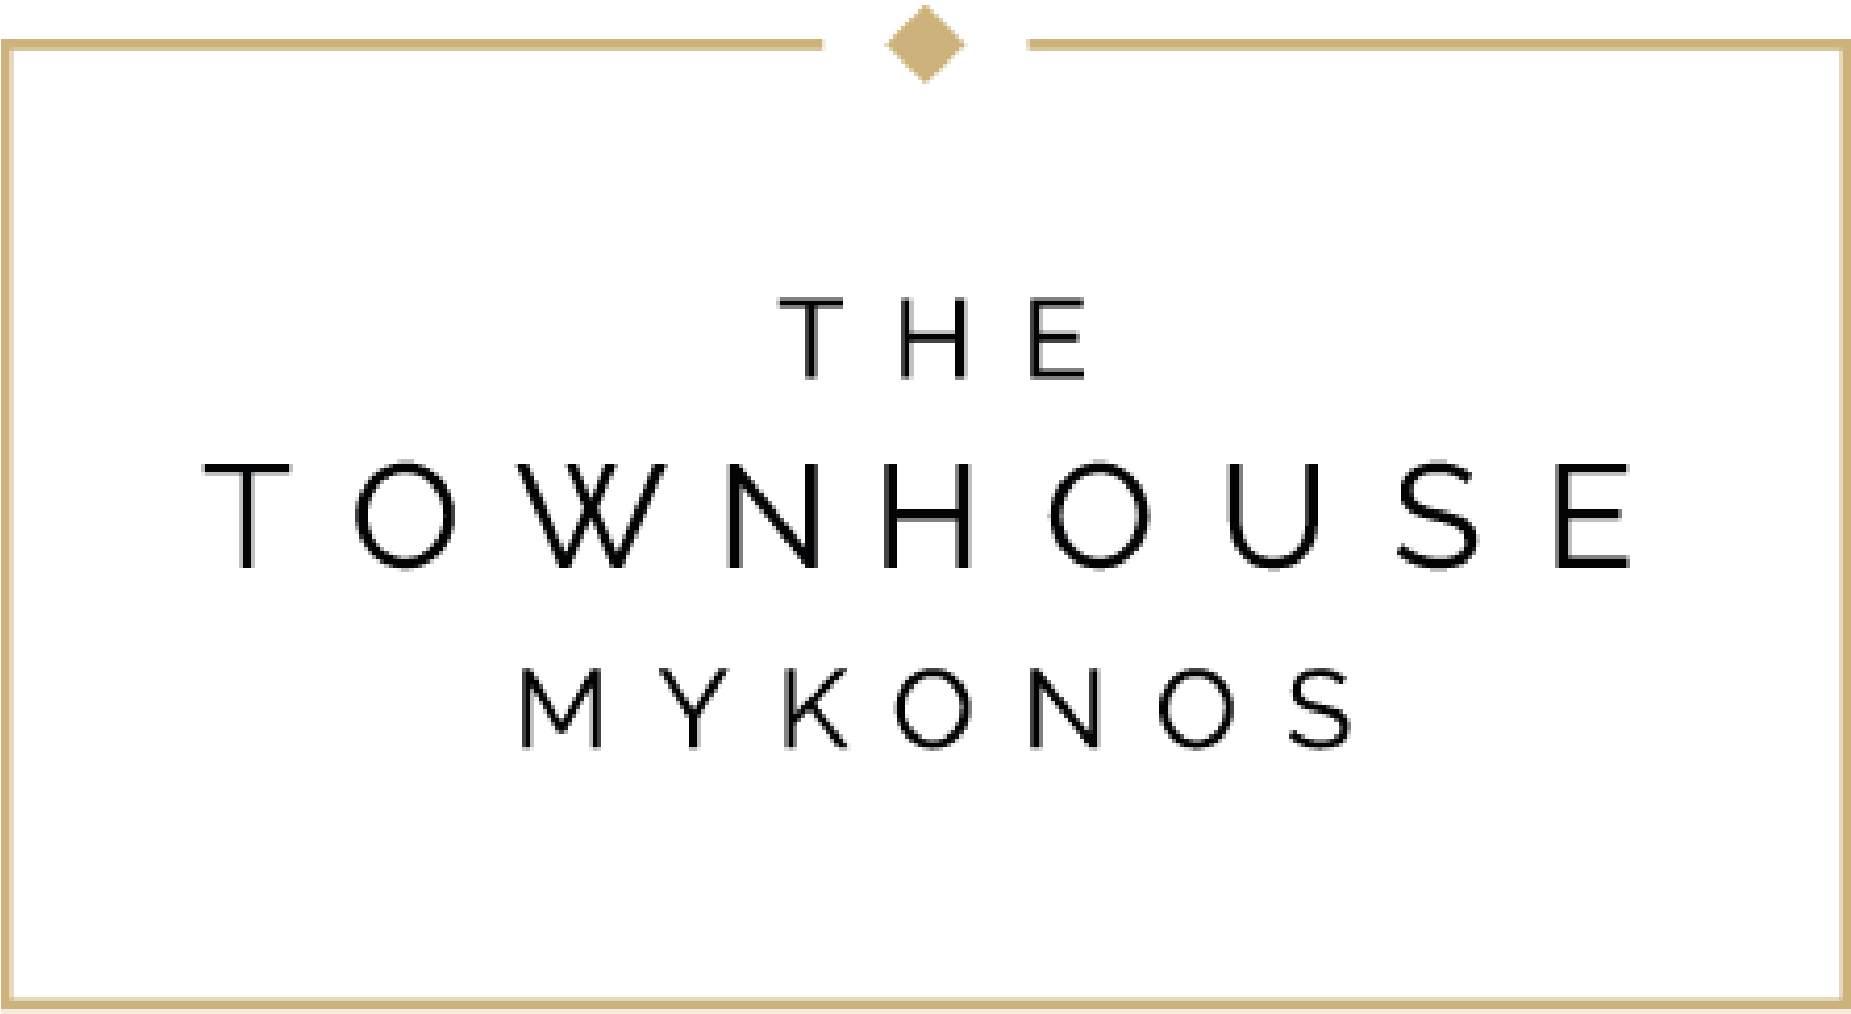 Townhouse Mykonos  white background